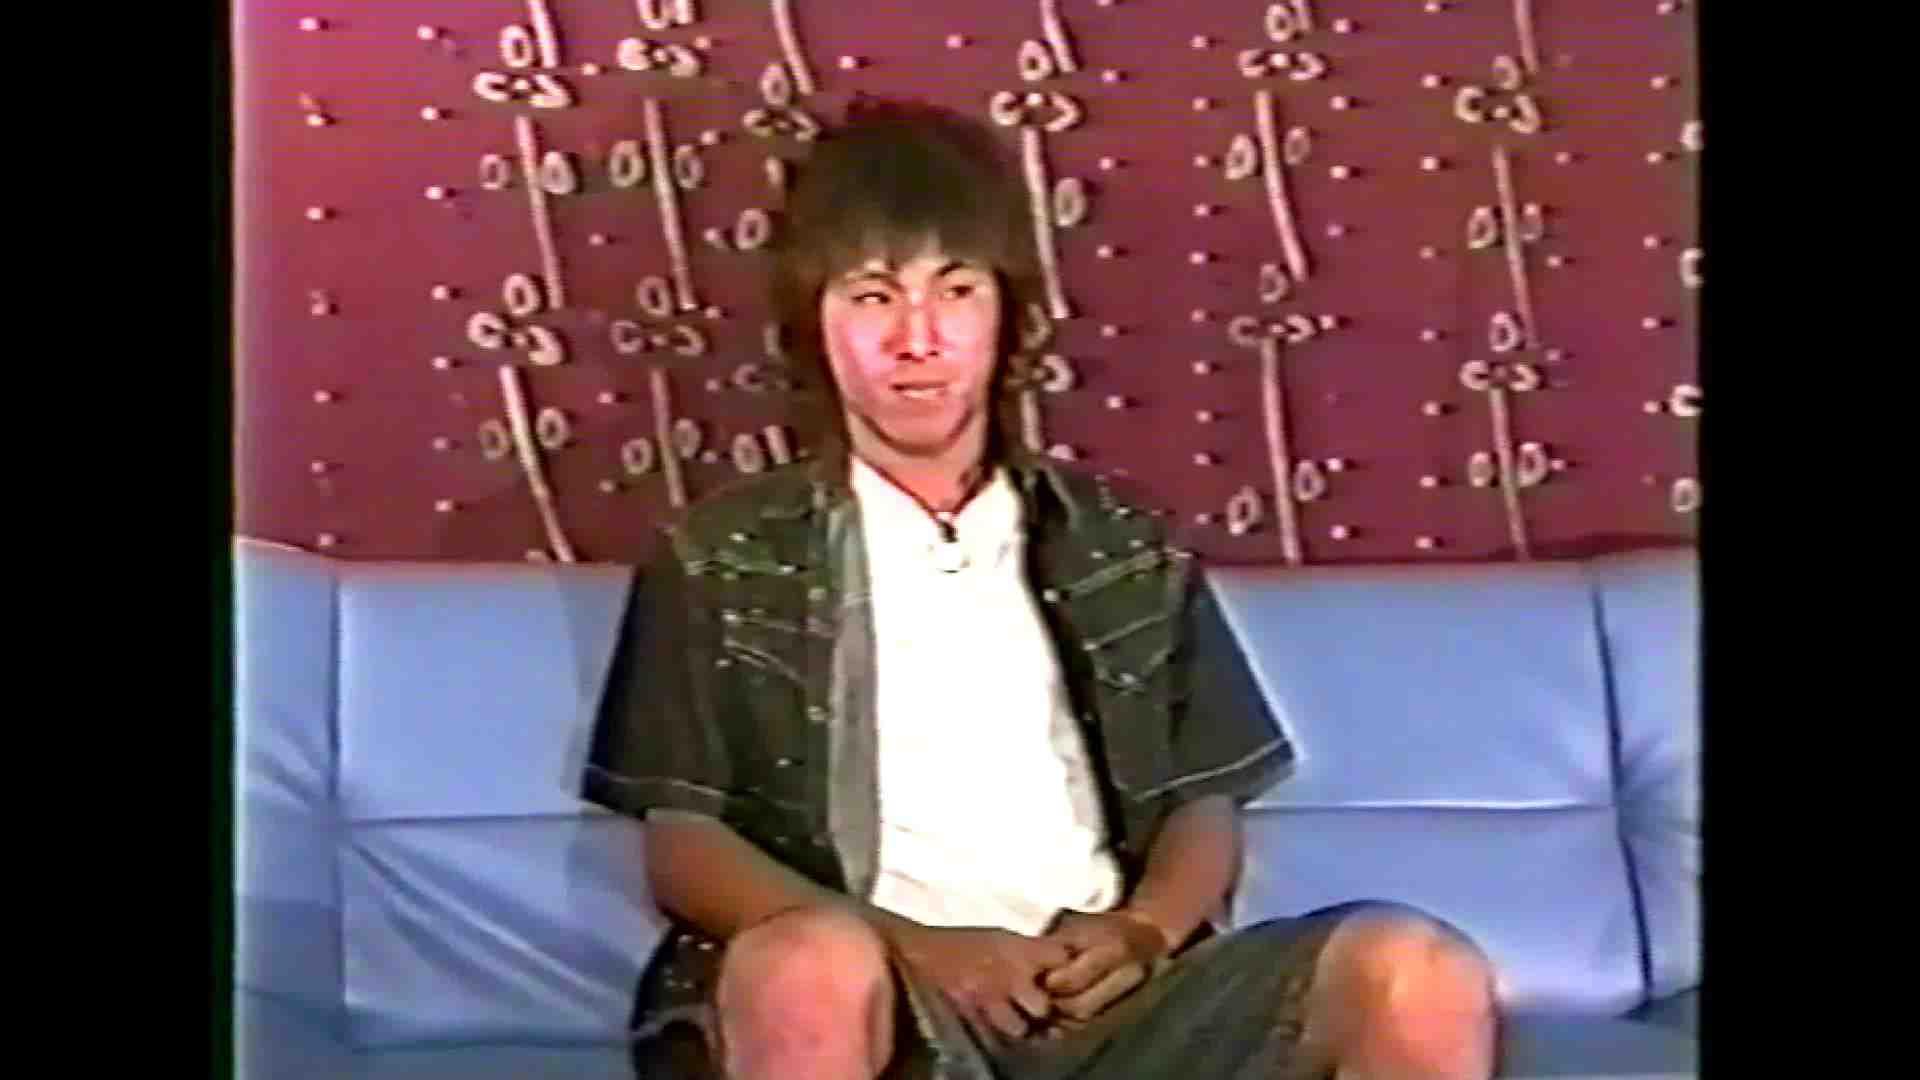 GAYBOY宏のオカズ倉庫Vol.3-1 まじ生挿入 | 口内に発射 ペニス画像 98pic 31